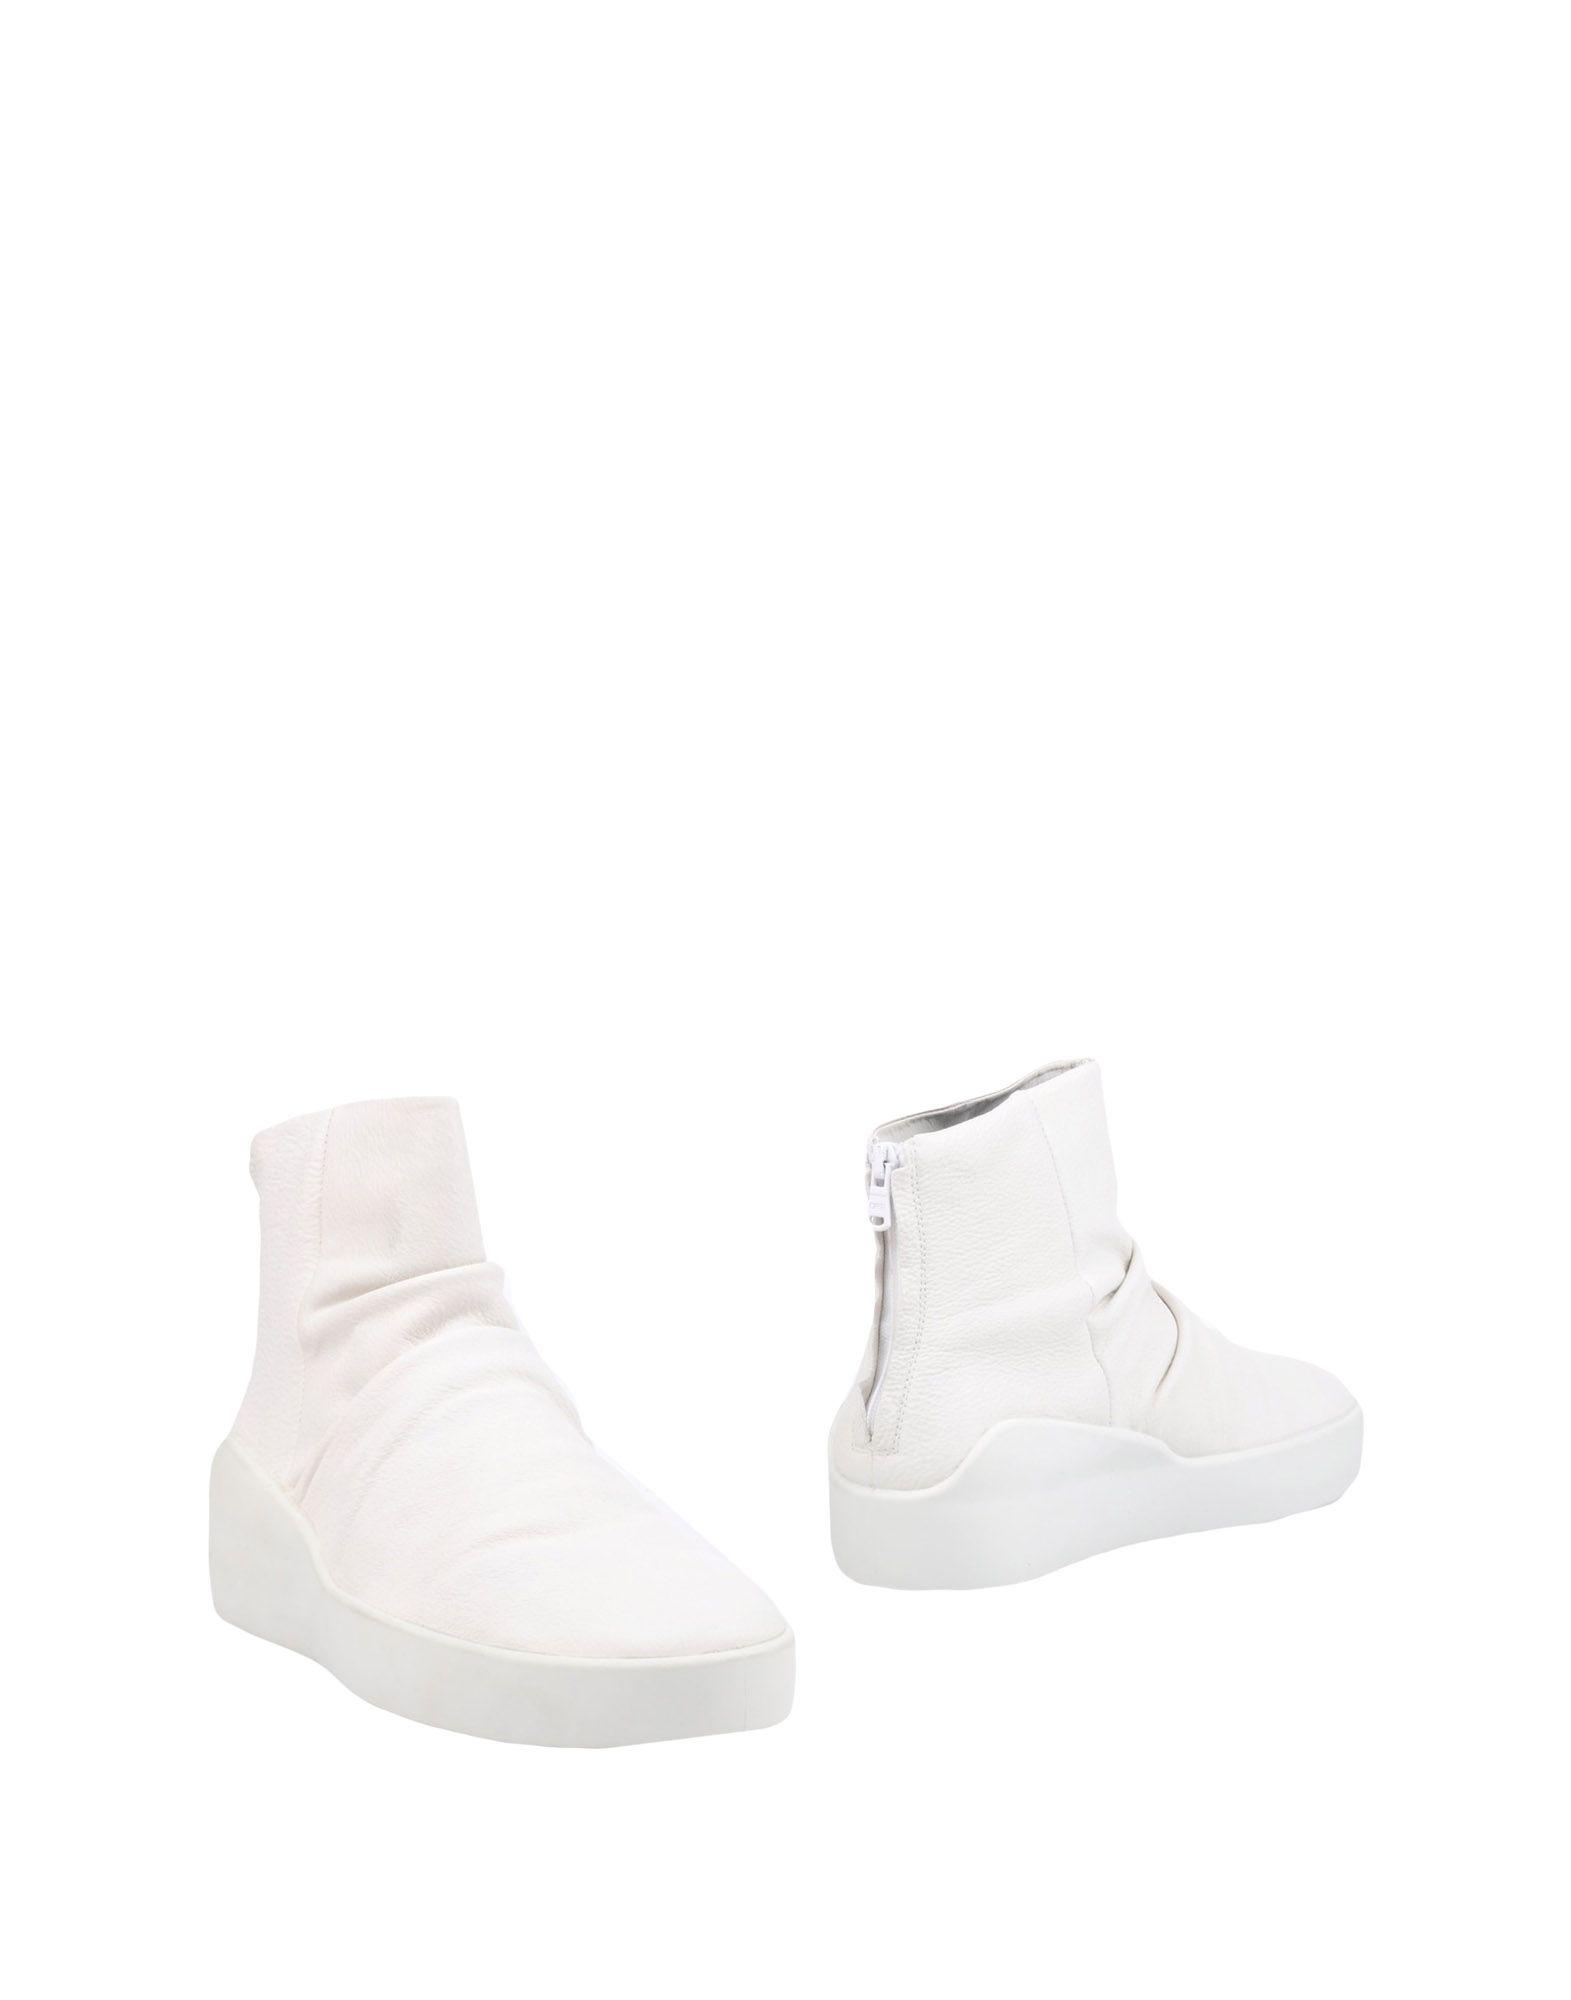 ECCO x THE LAST CONSPIRACY Полусапоги и высокие ботинки женские сапоги ecco 351123 14 11001 01220